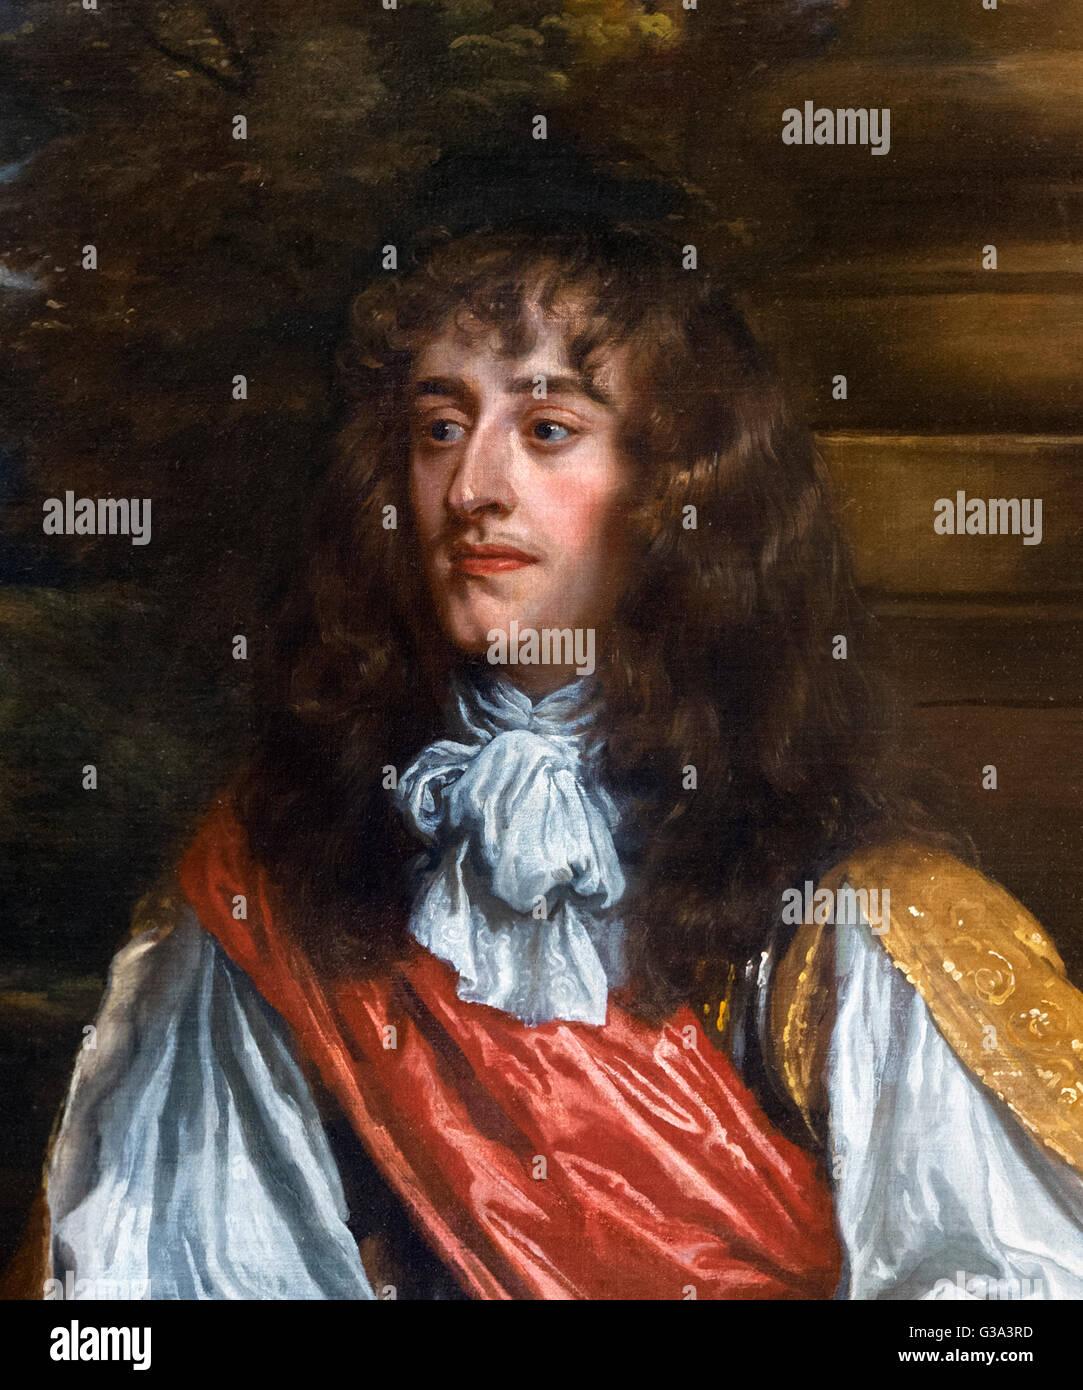 James II and VII (1633–1701), King of England and Ireland as James II and King of Scotland as James VII. Portrait - Stock Image